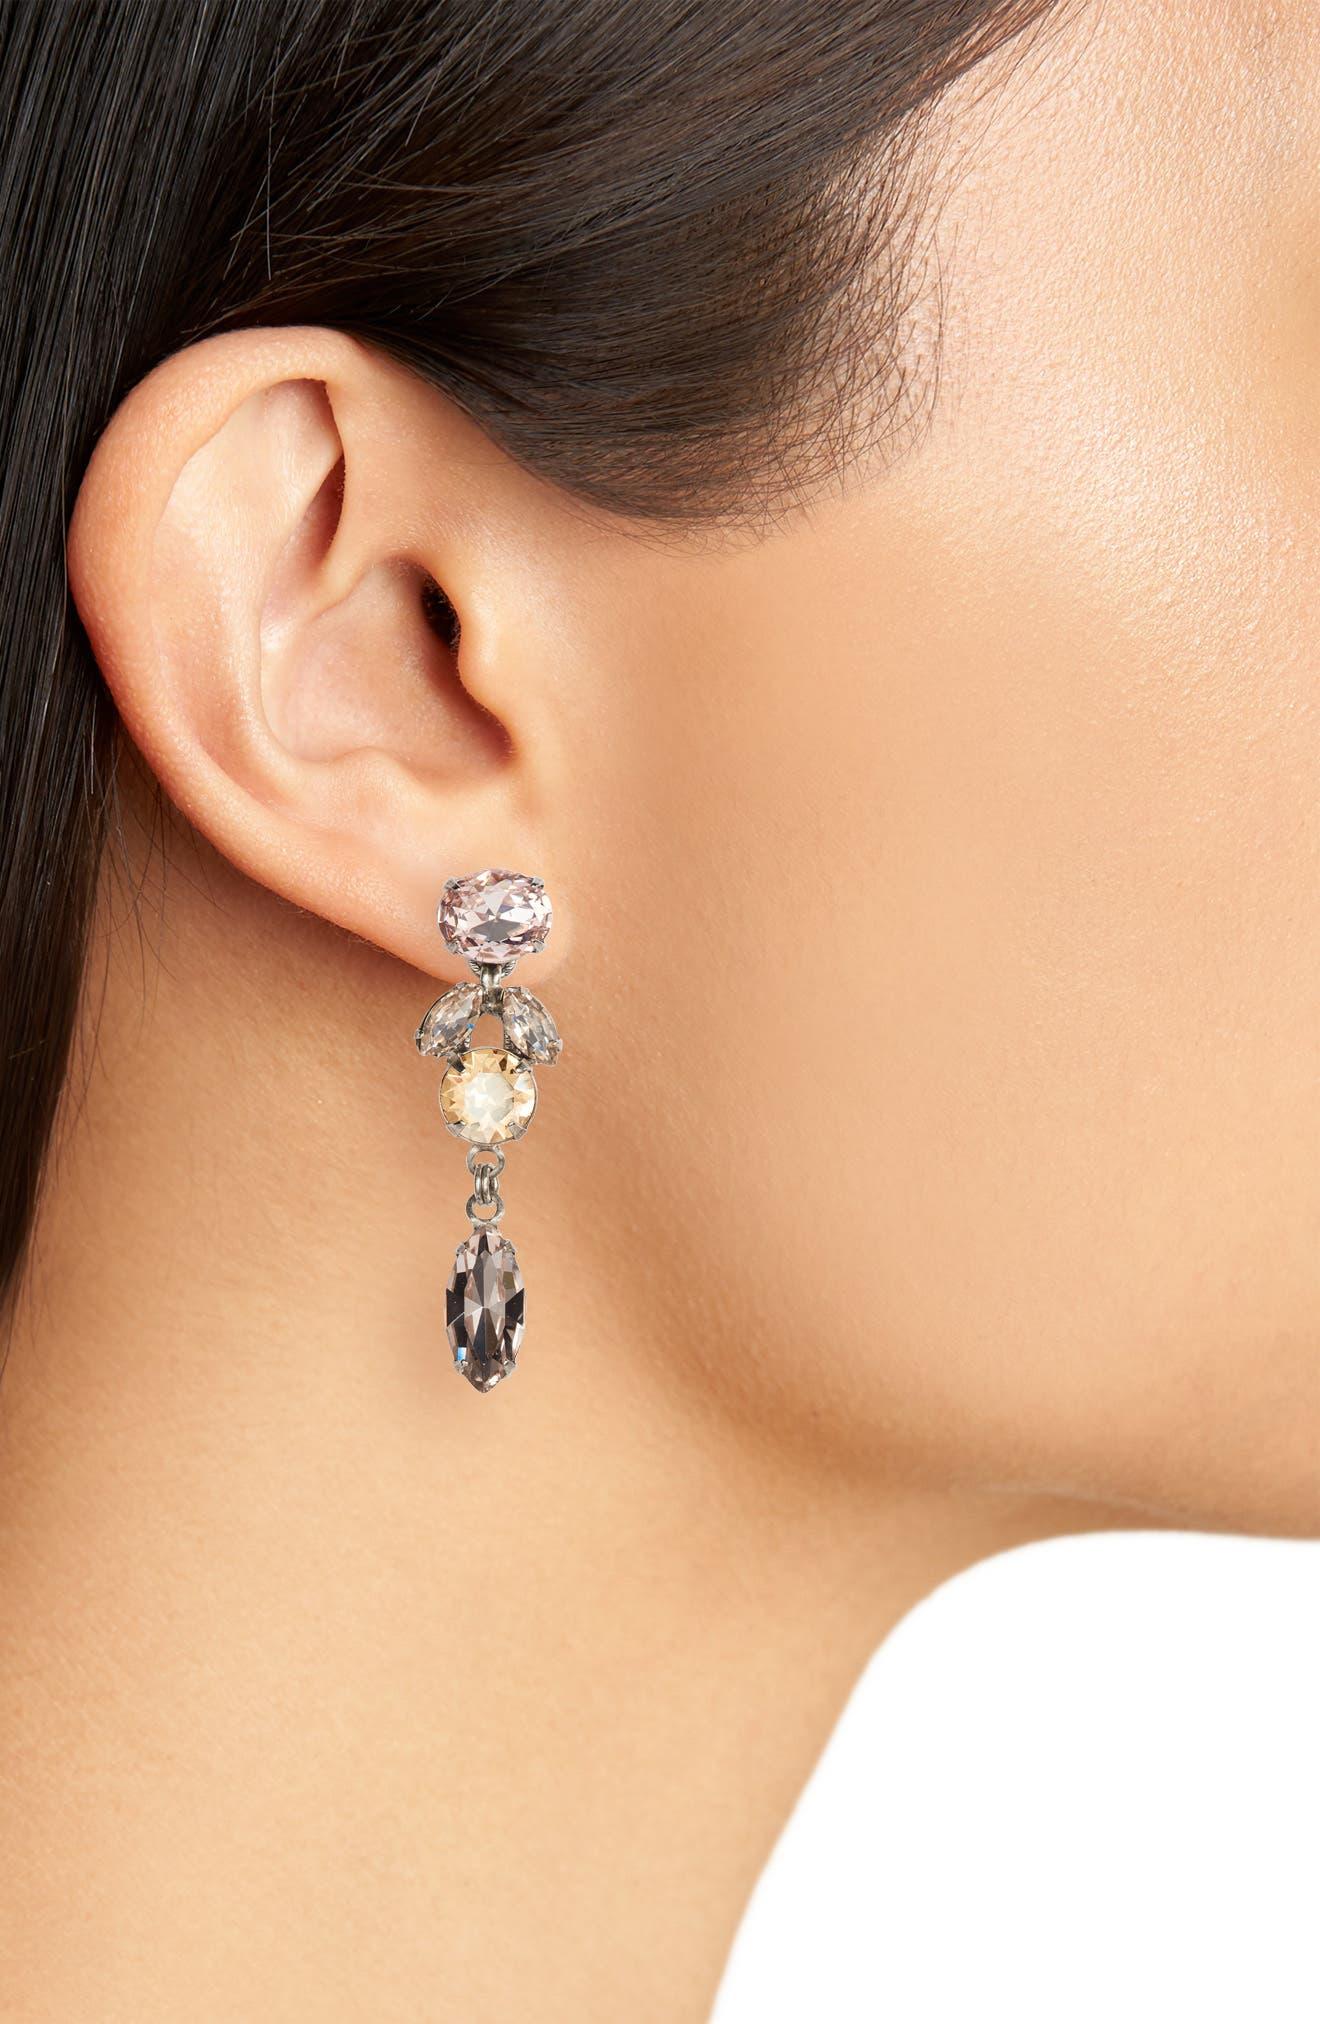 Sparkling Siren Crystal Earrings,                             Alternate thumbnail 2, color,                             Pink